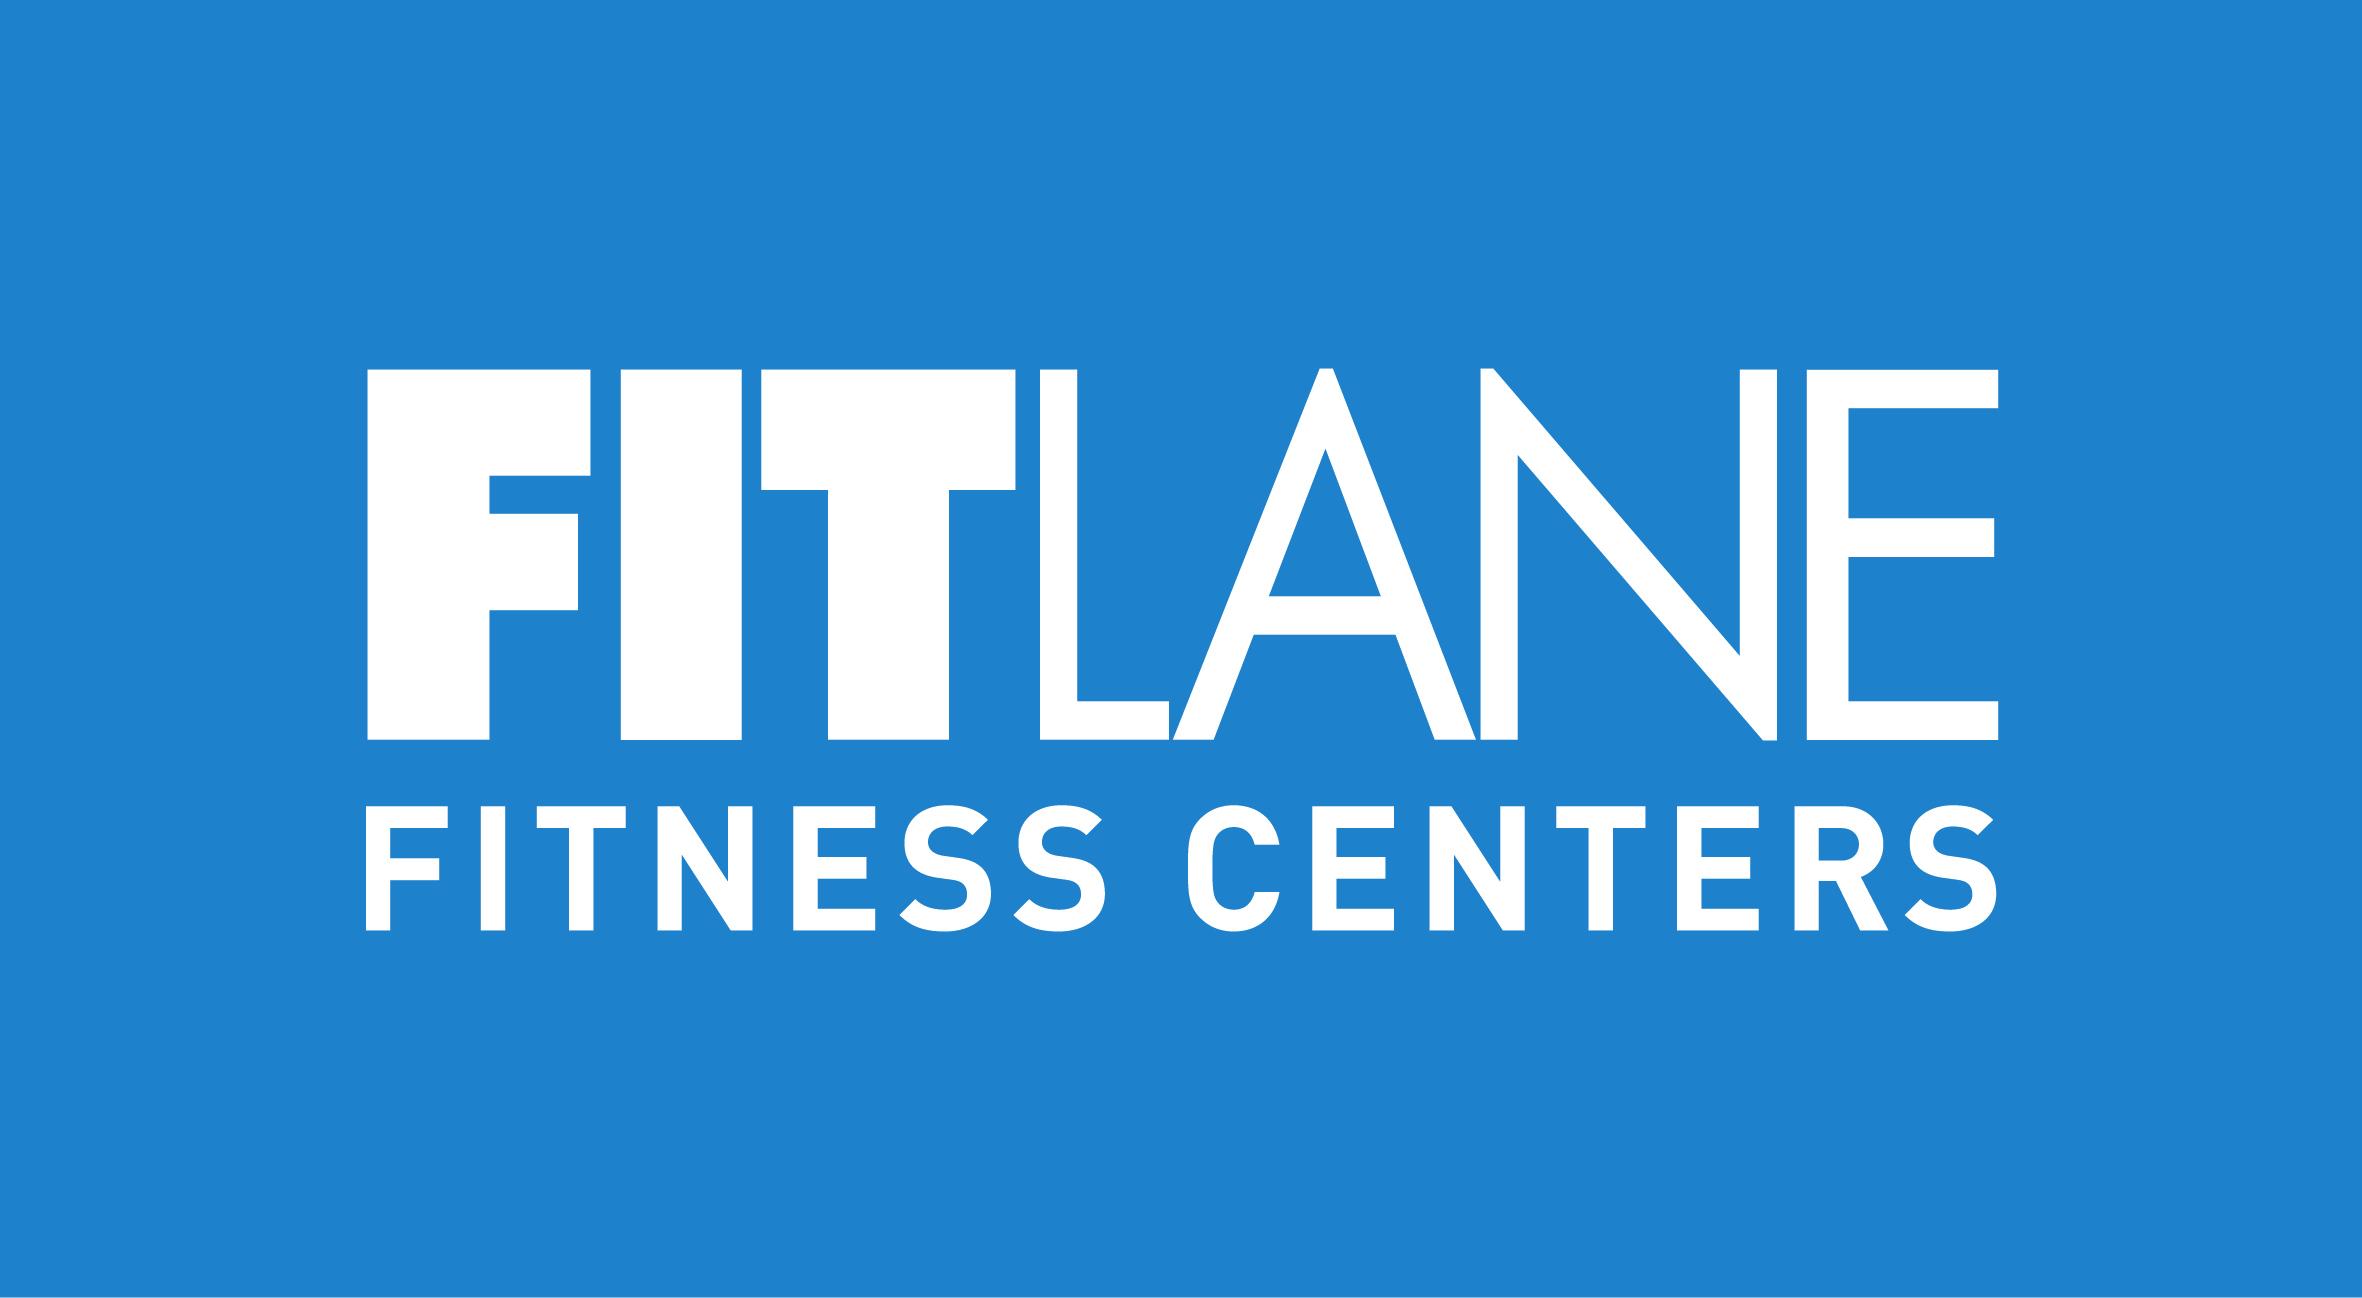 fitlane_logo_jpg